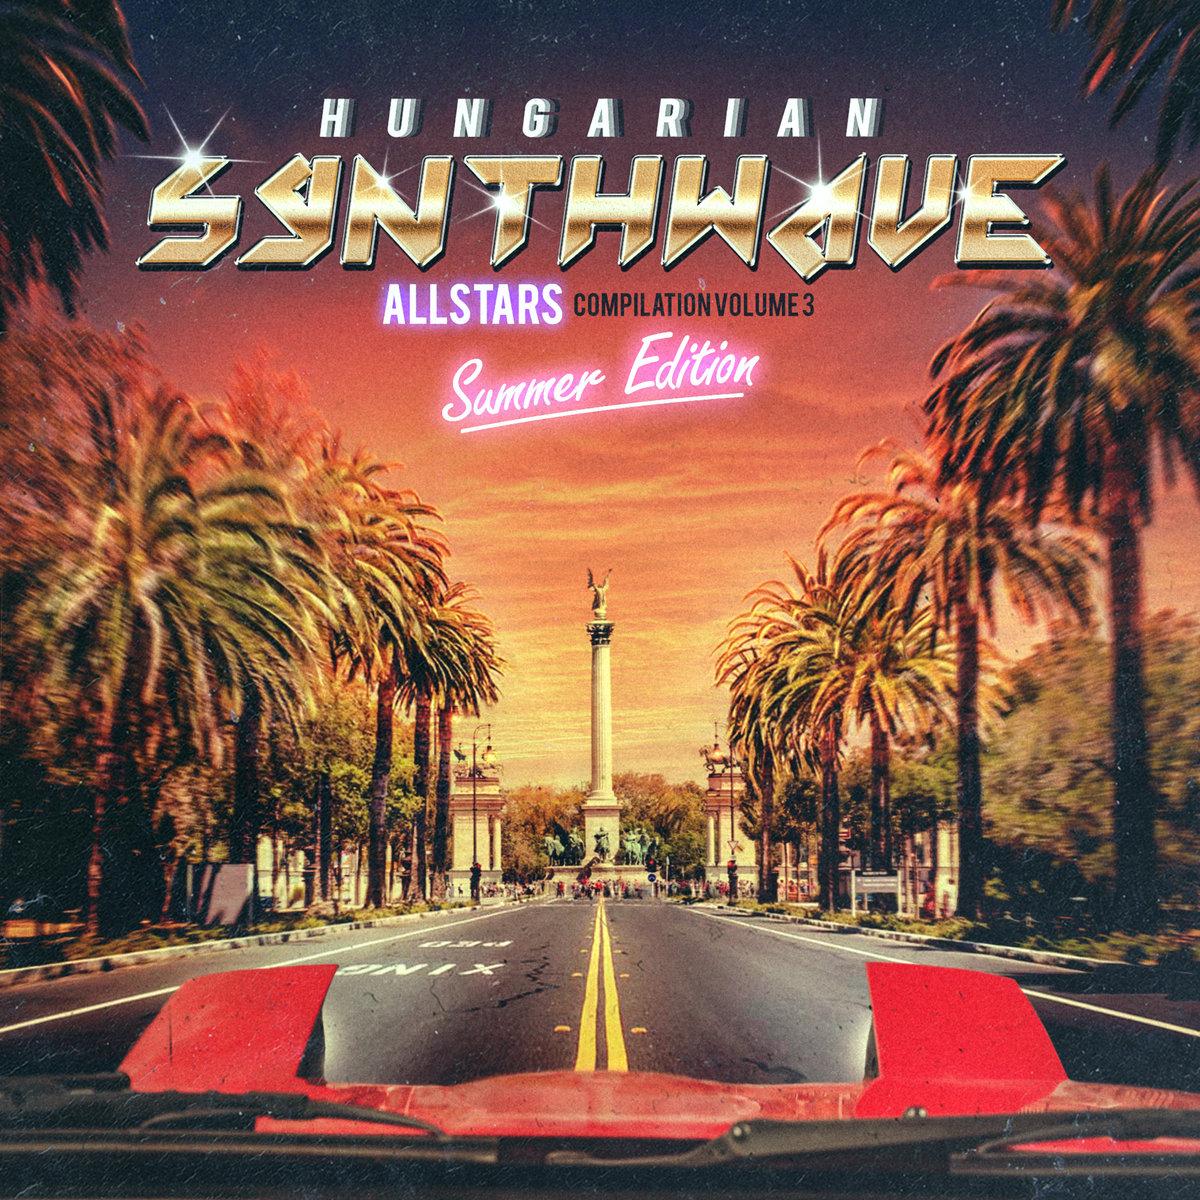 Hungarian Synthwave Allstars